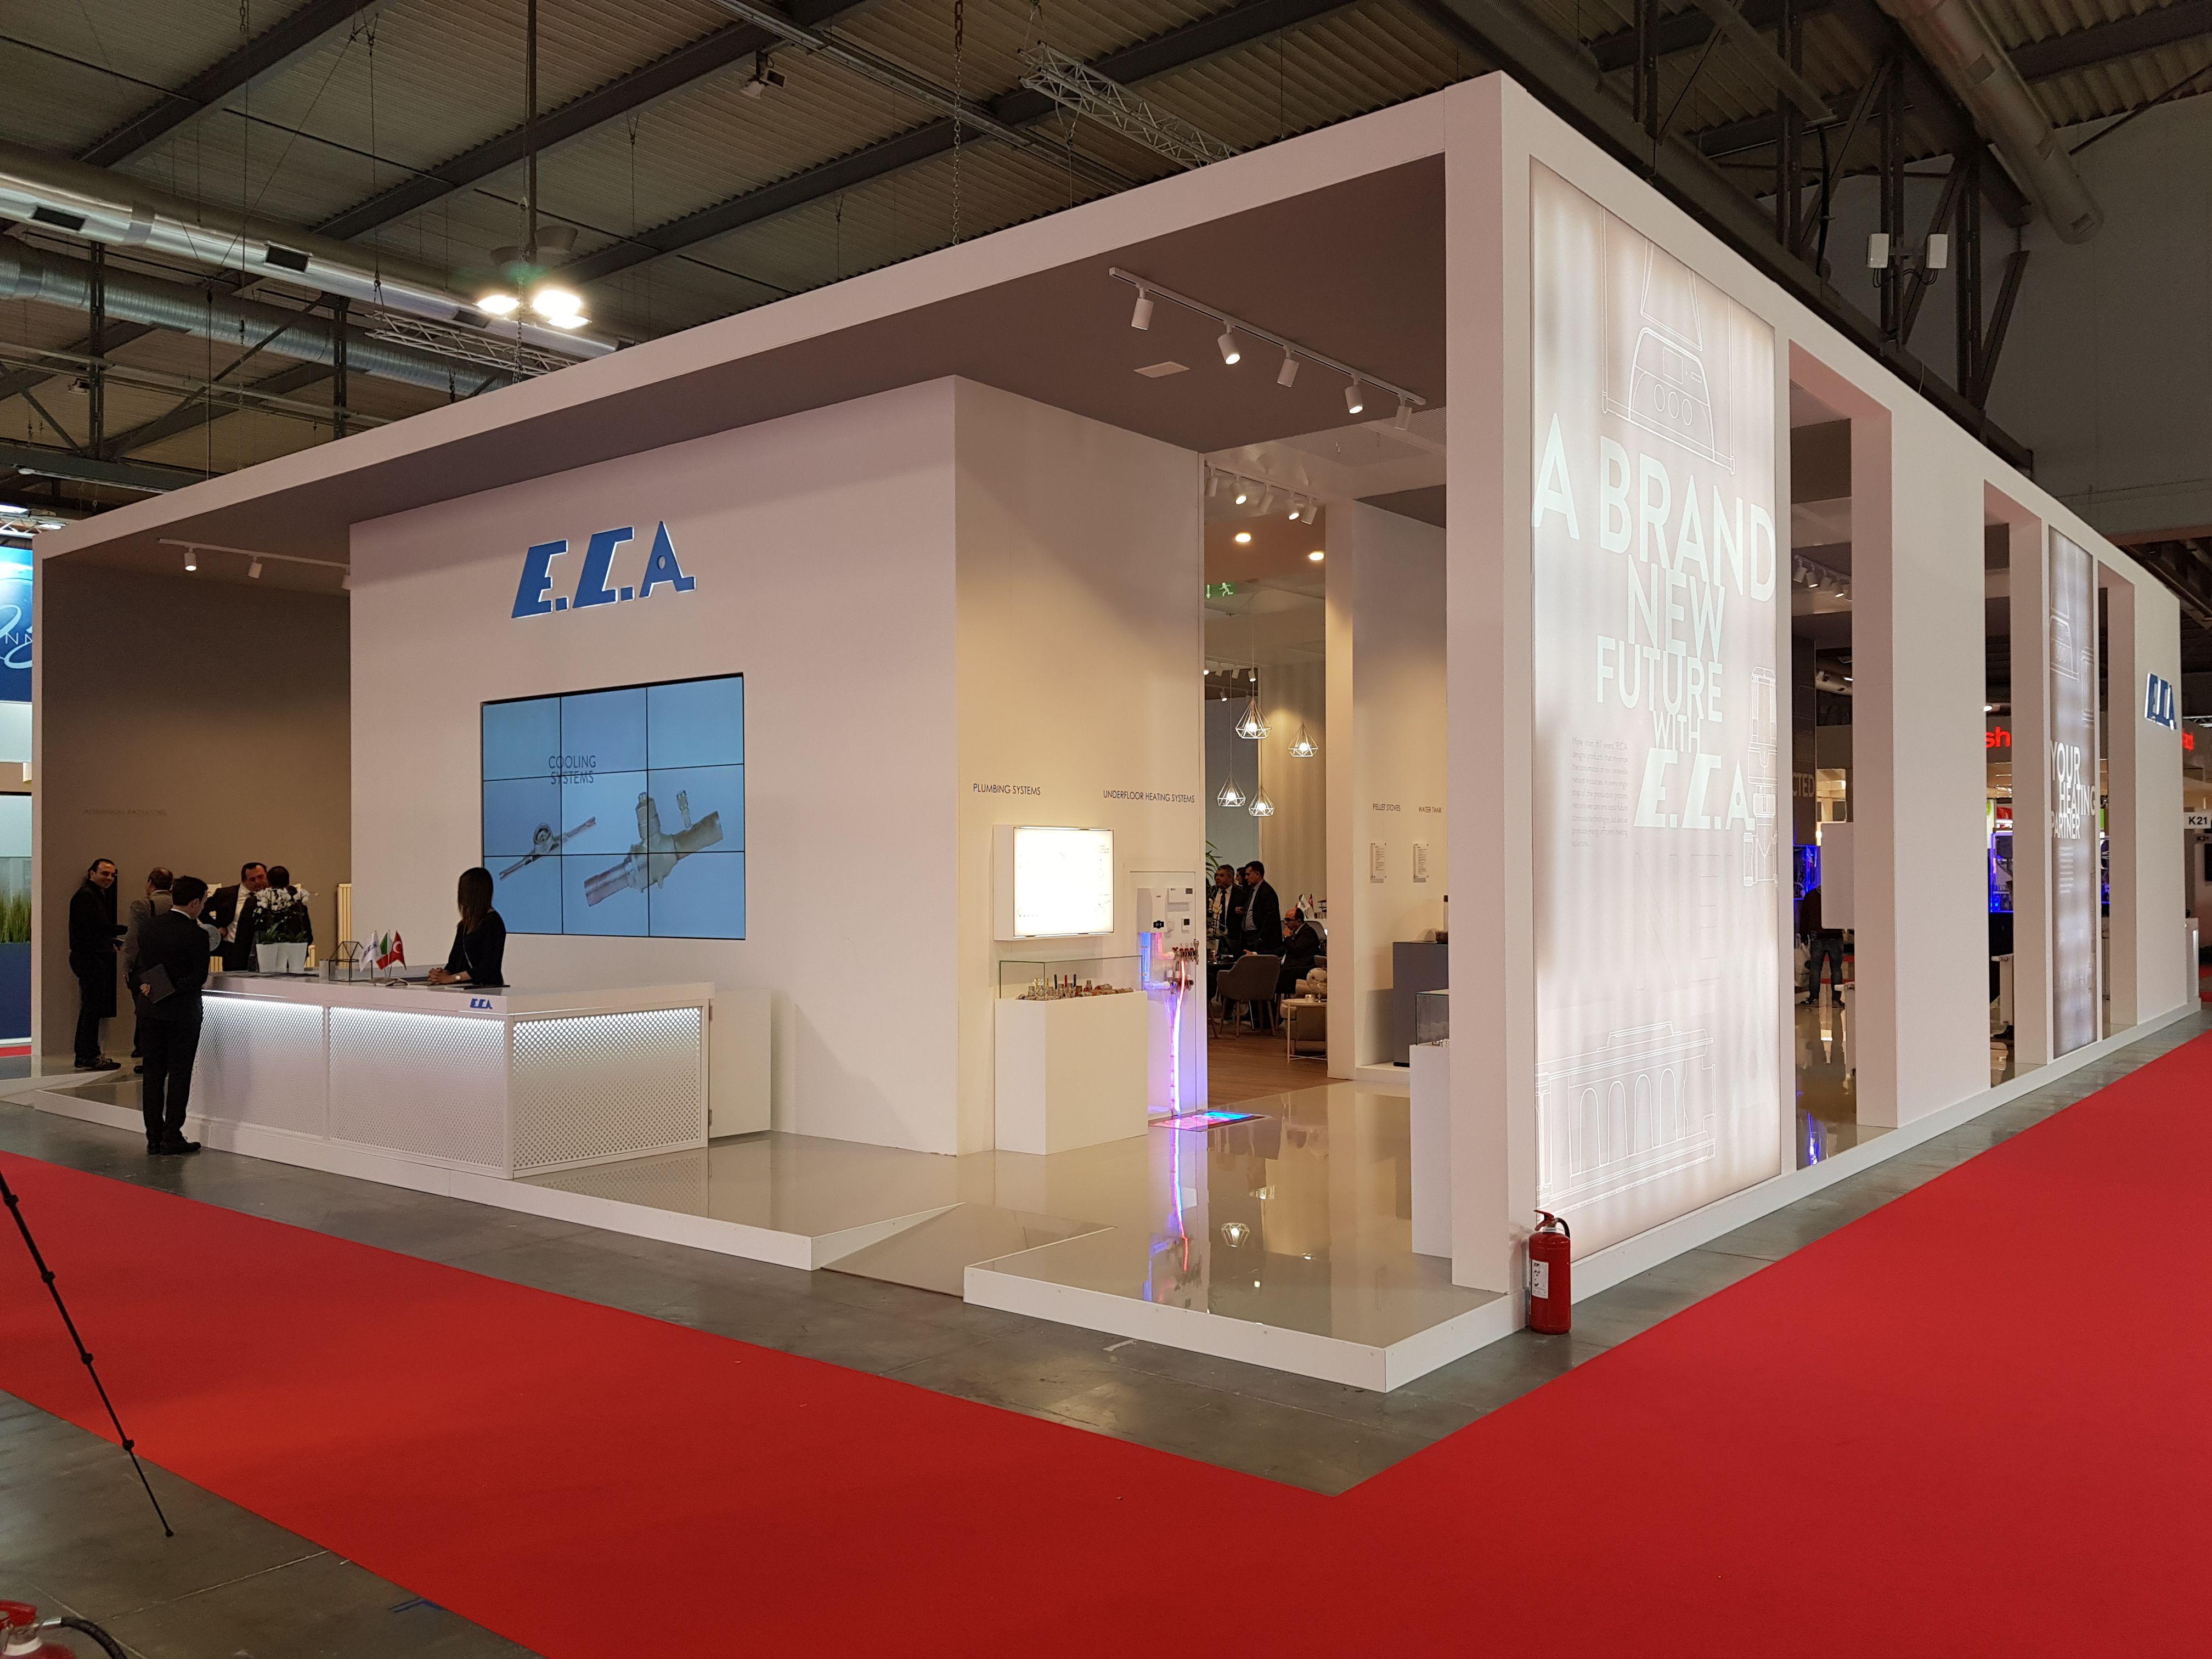 Mostra Design Milano 2018 eca ,milano 2018 / @mostra | home decor, bathroom lighting